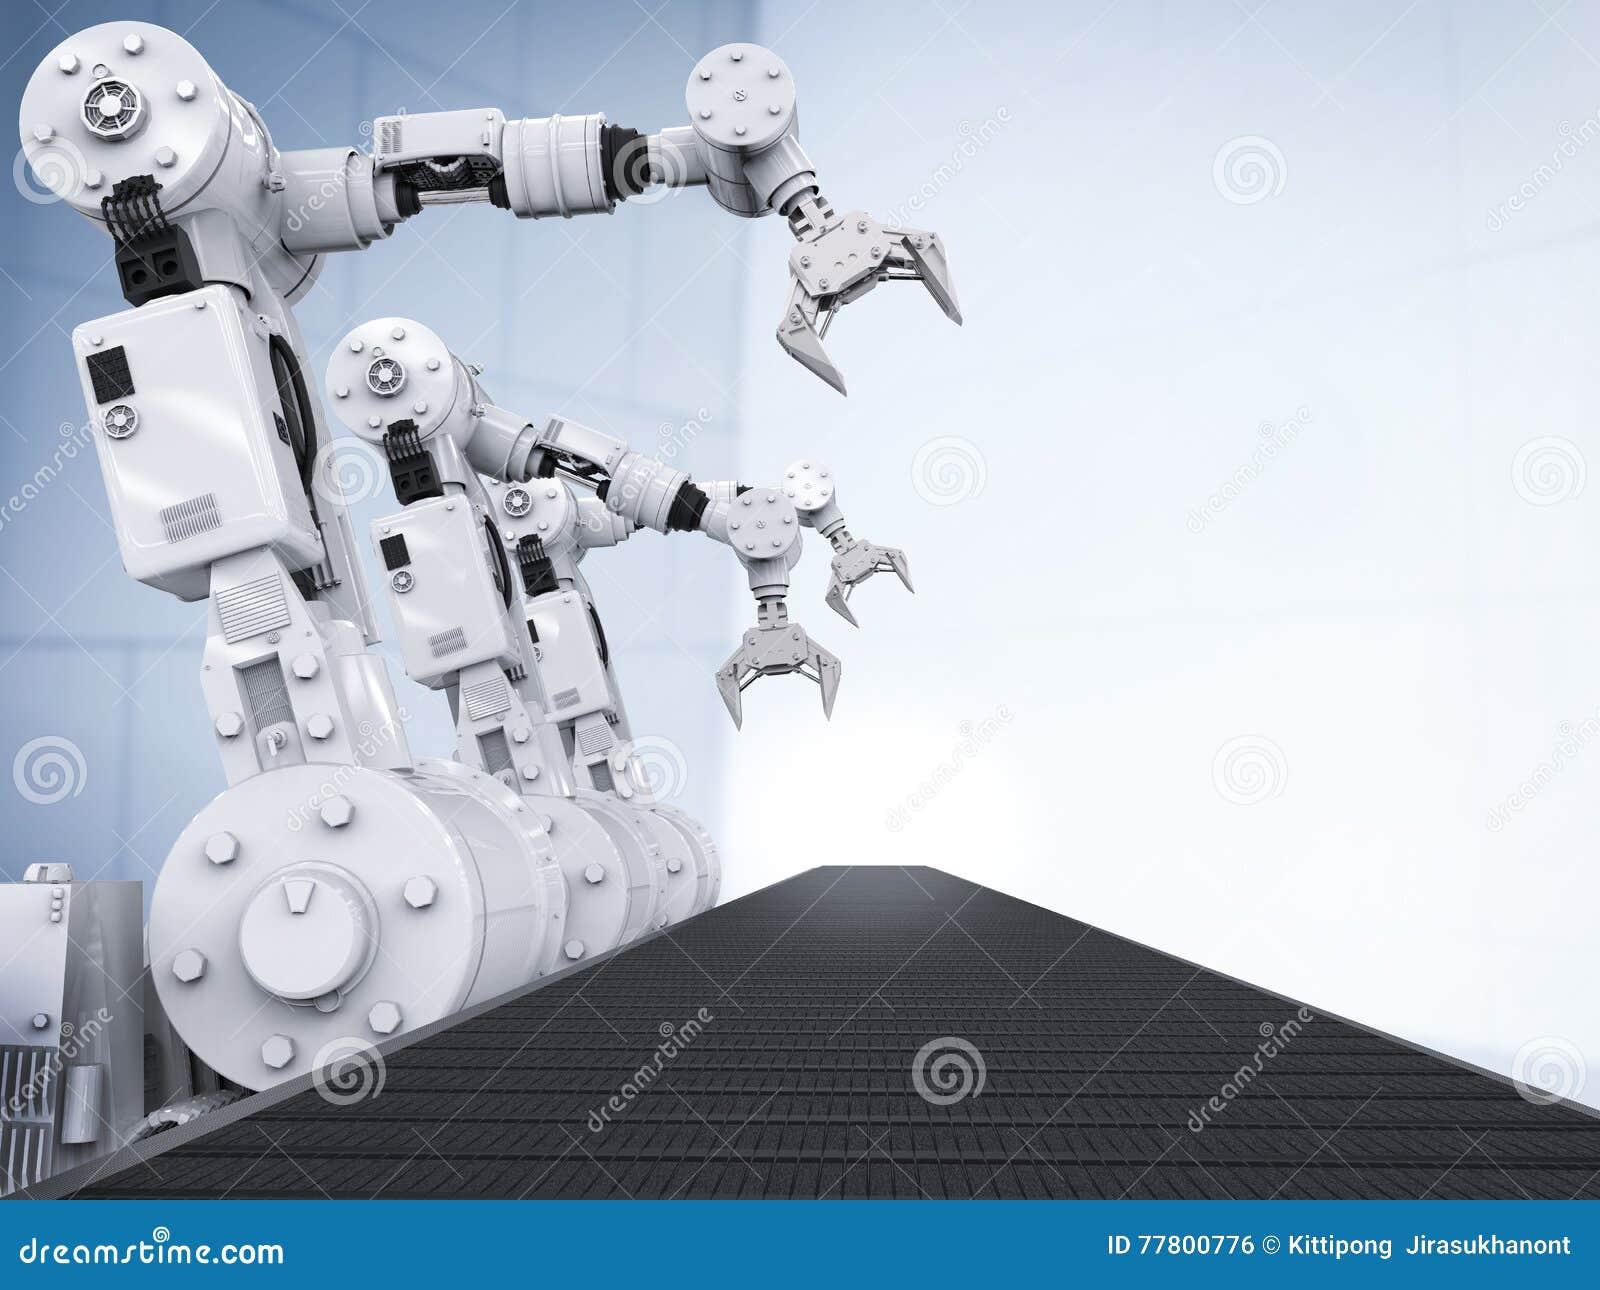 Robotachtige wapens met lege transportband